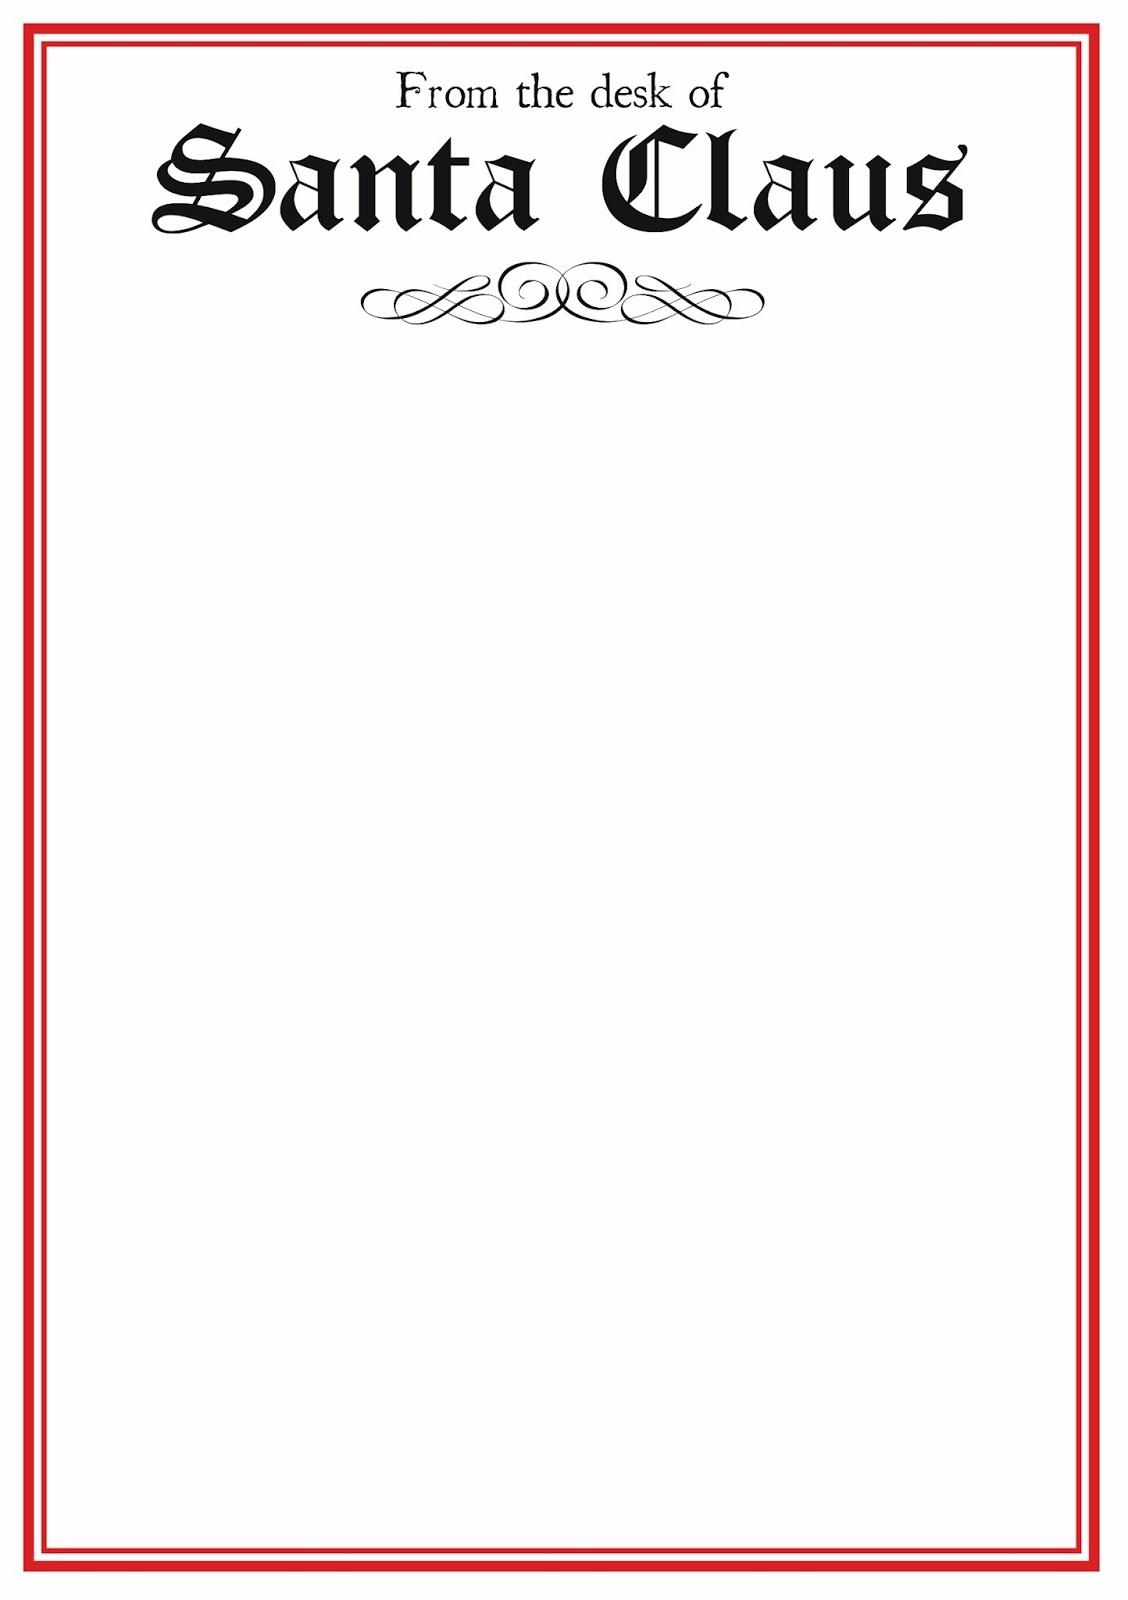 Free Letter From Santa Word Template - Tutlin.psstech.co - Free Printable Letter From Santa Template